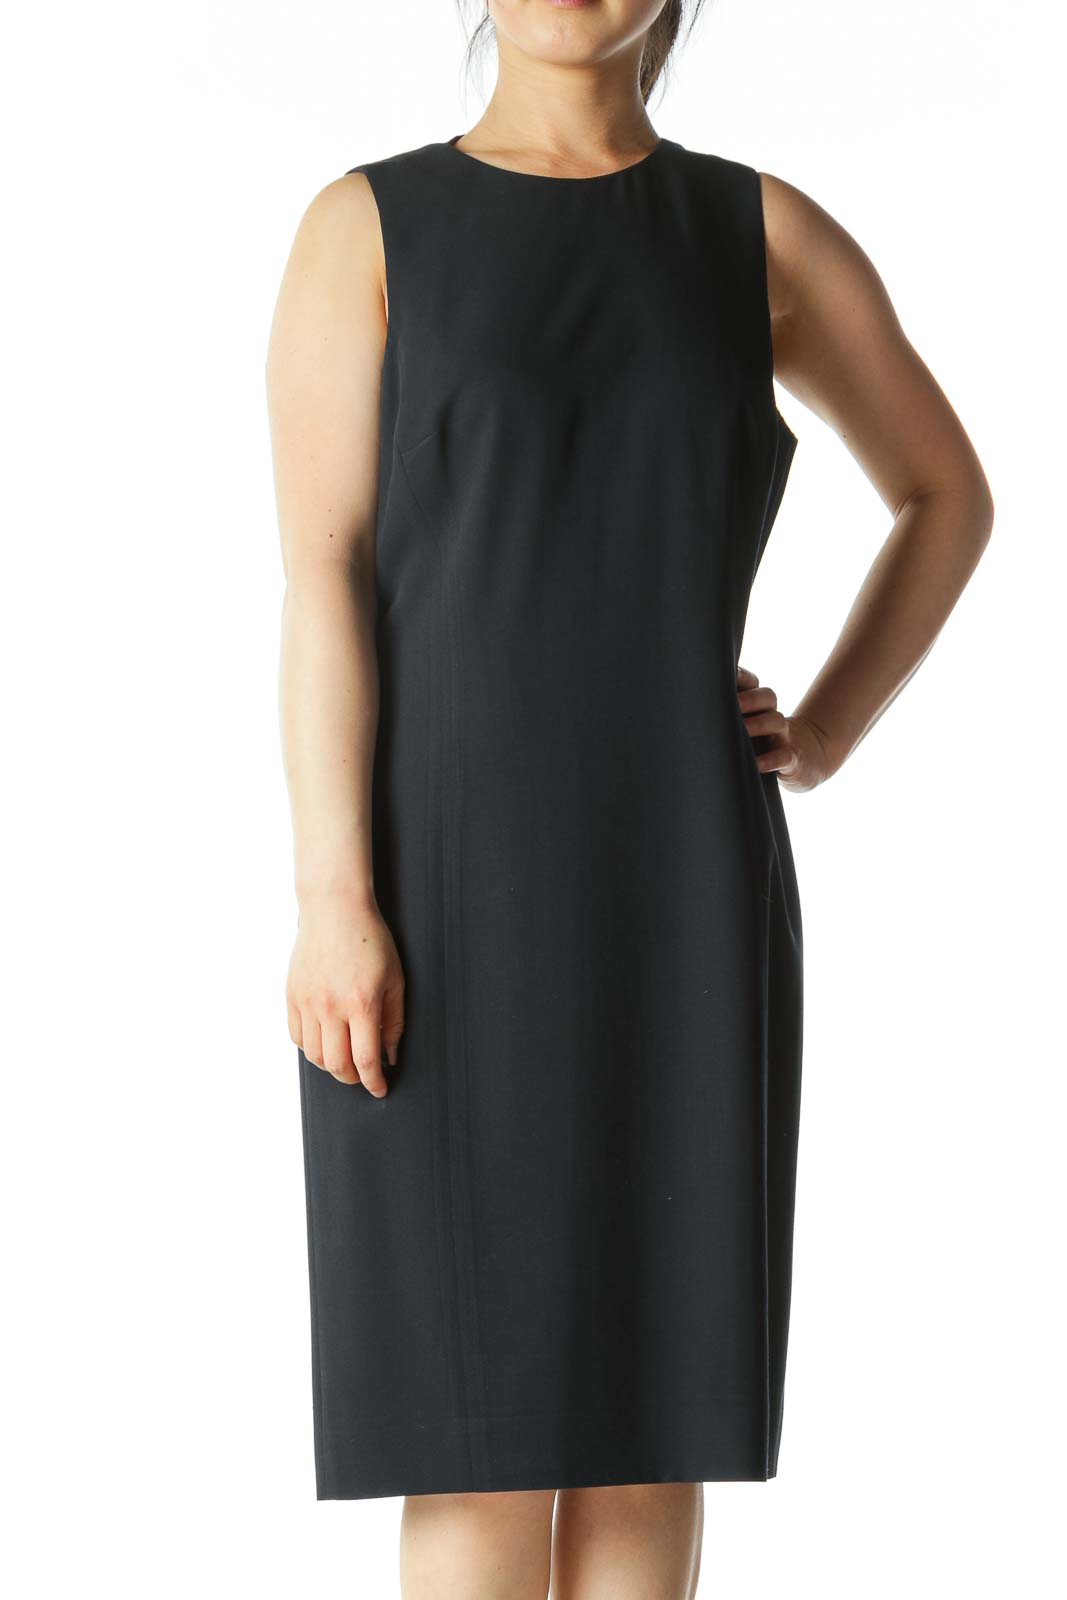 Navy-Blue Round-Neck Sleeveless Work Dress Front